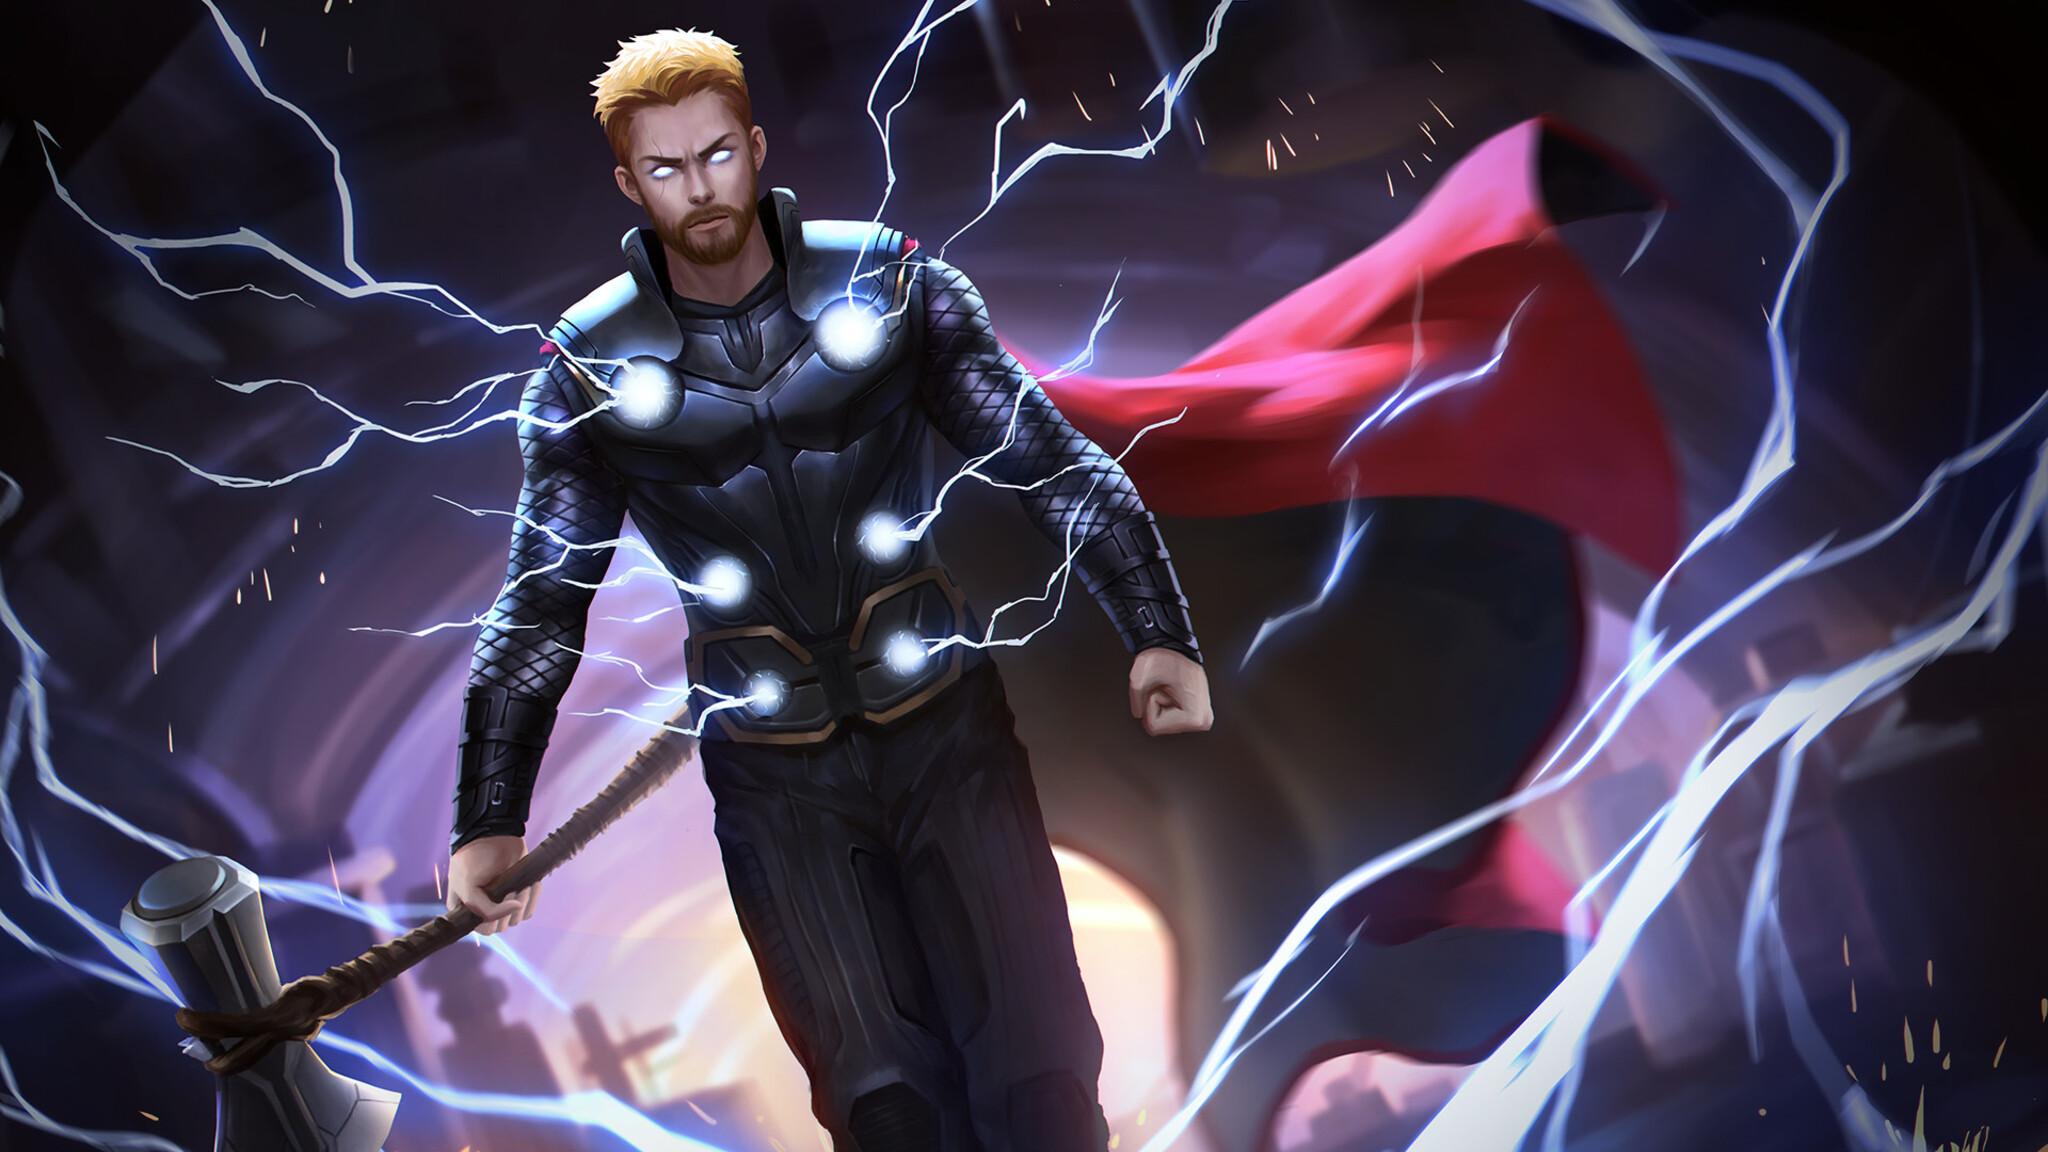 Thor Wallpaper 4k Infinity War Djiwallpaper Co